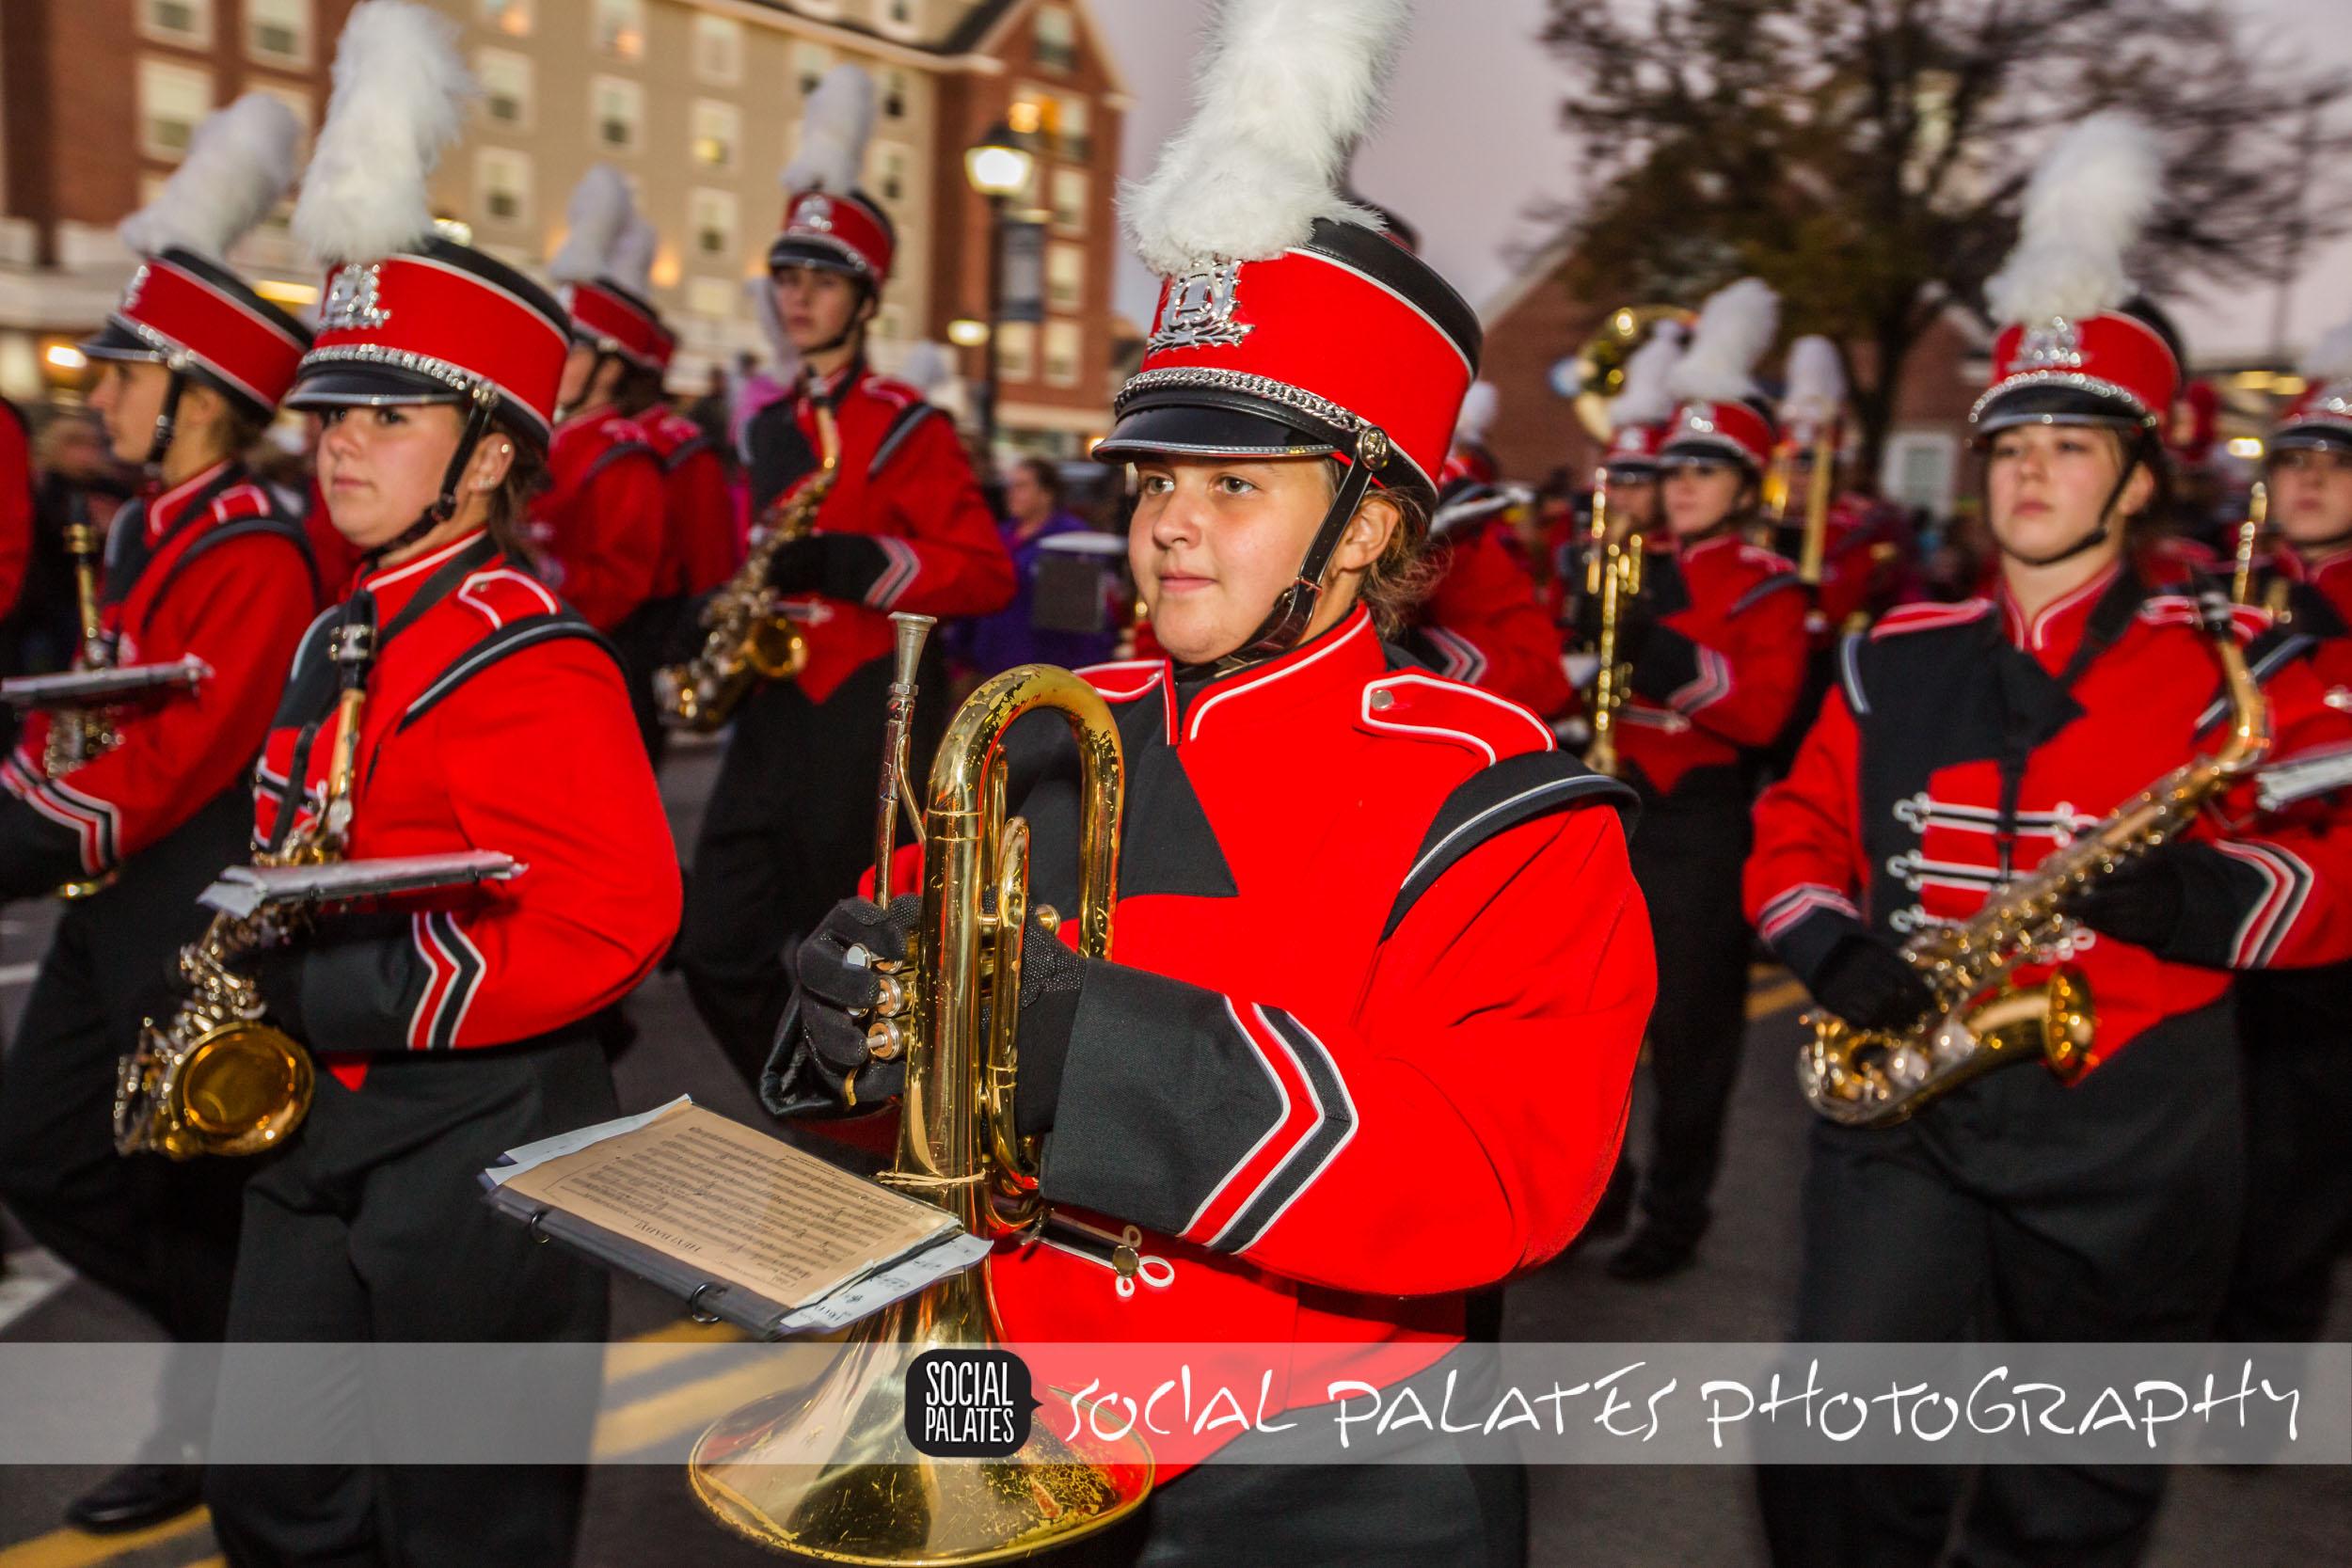 Haunted Happenings Parade 2014 Creative Salem by Social Palates-7313.jpg